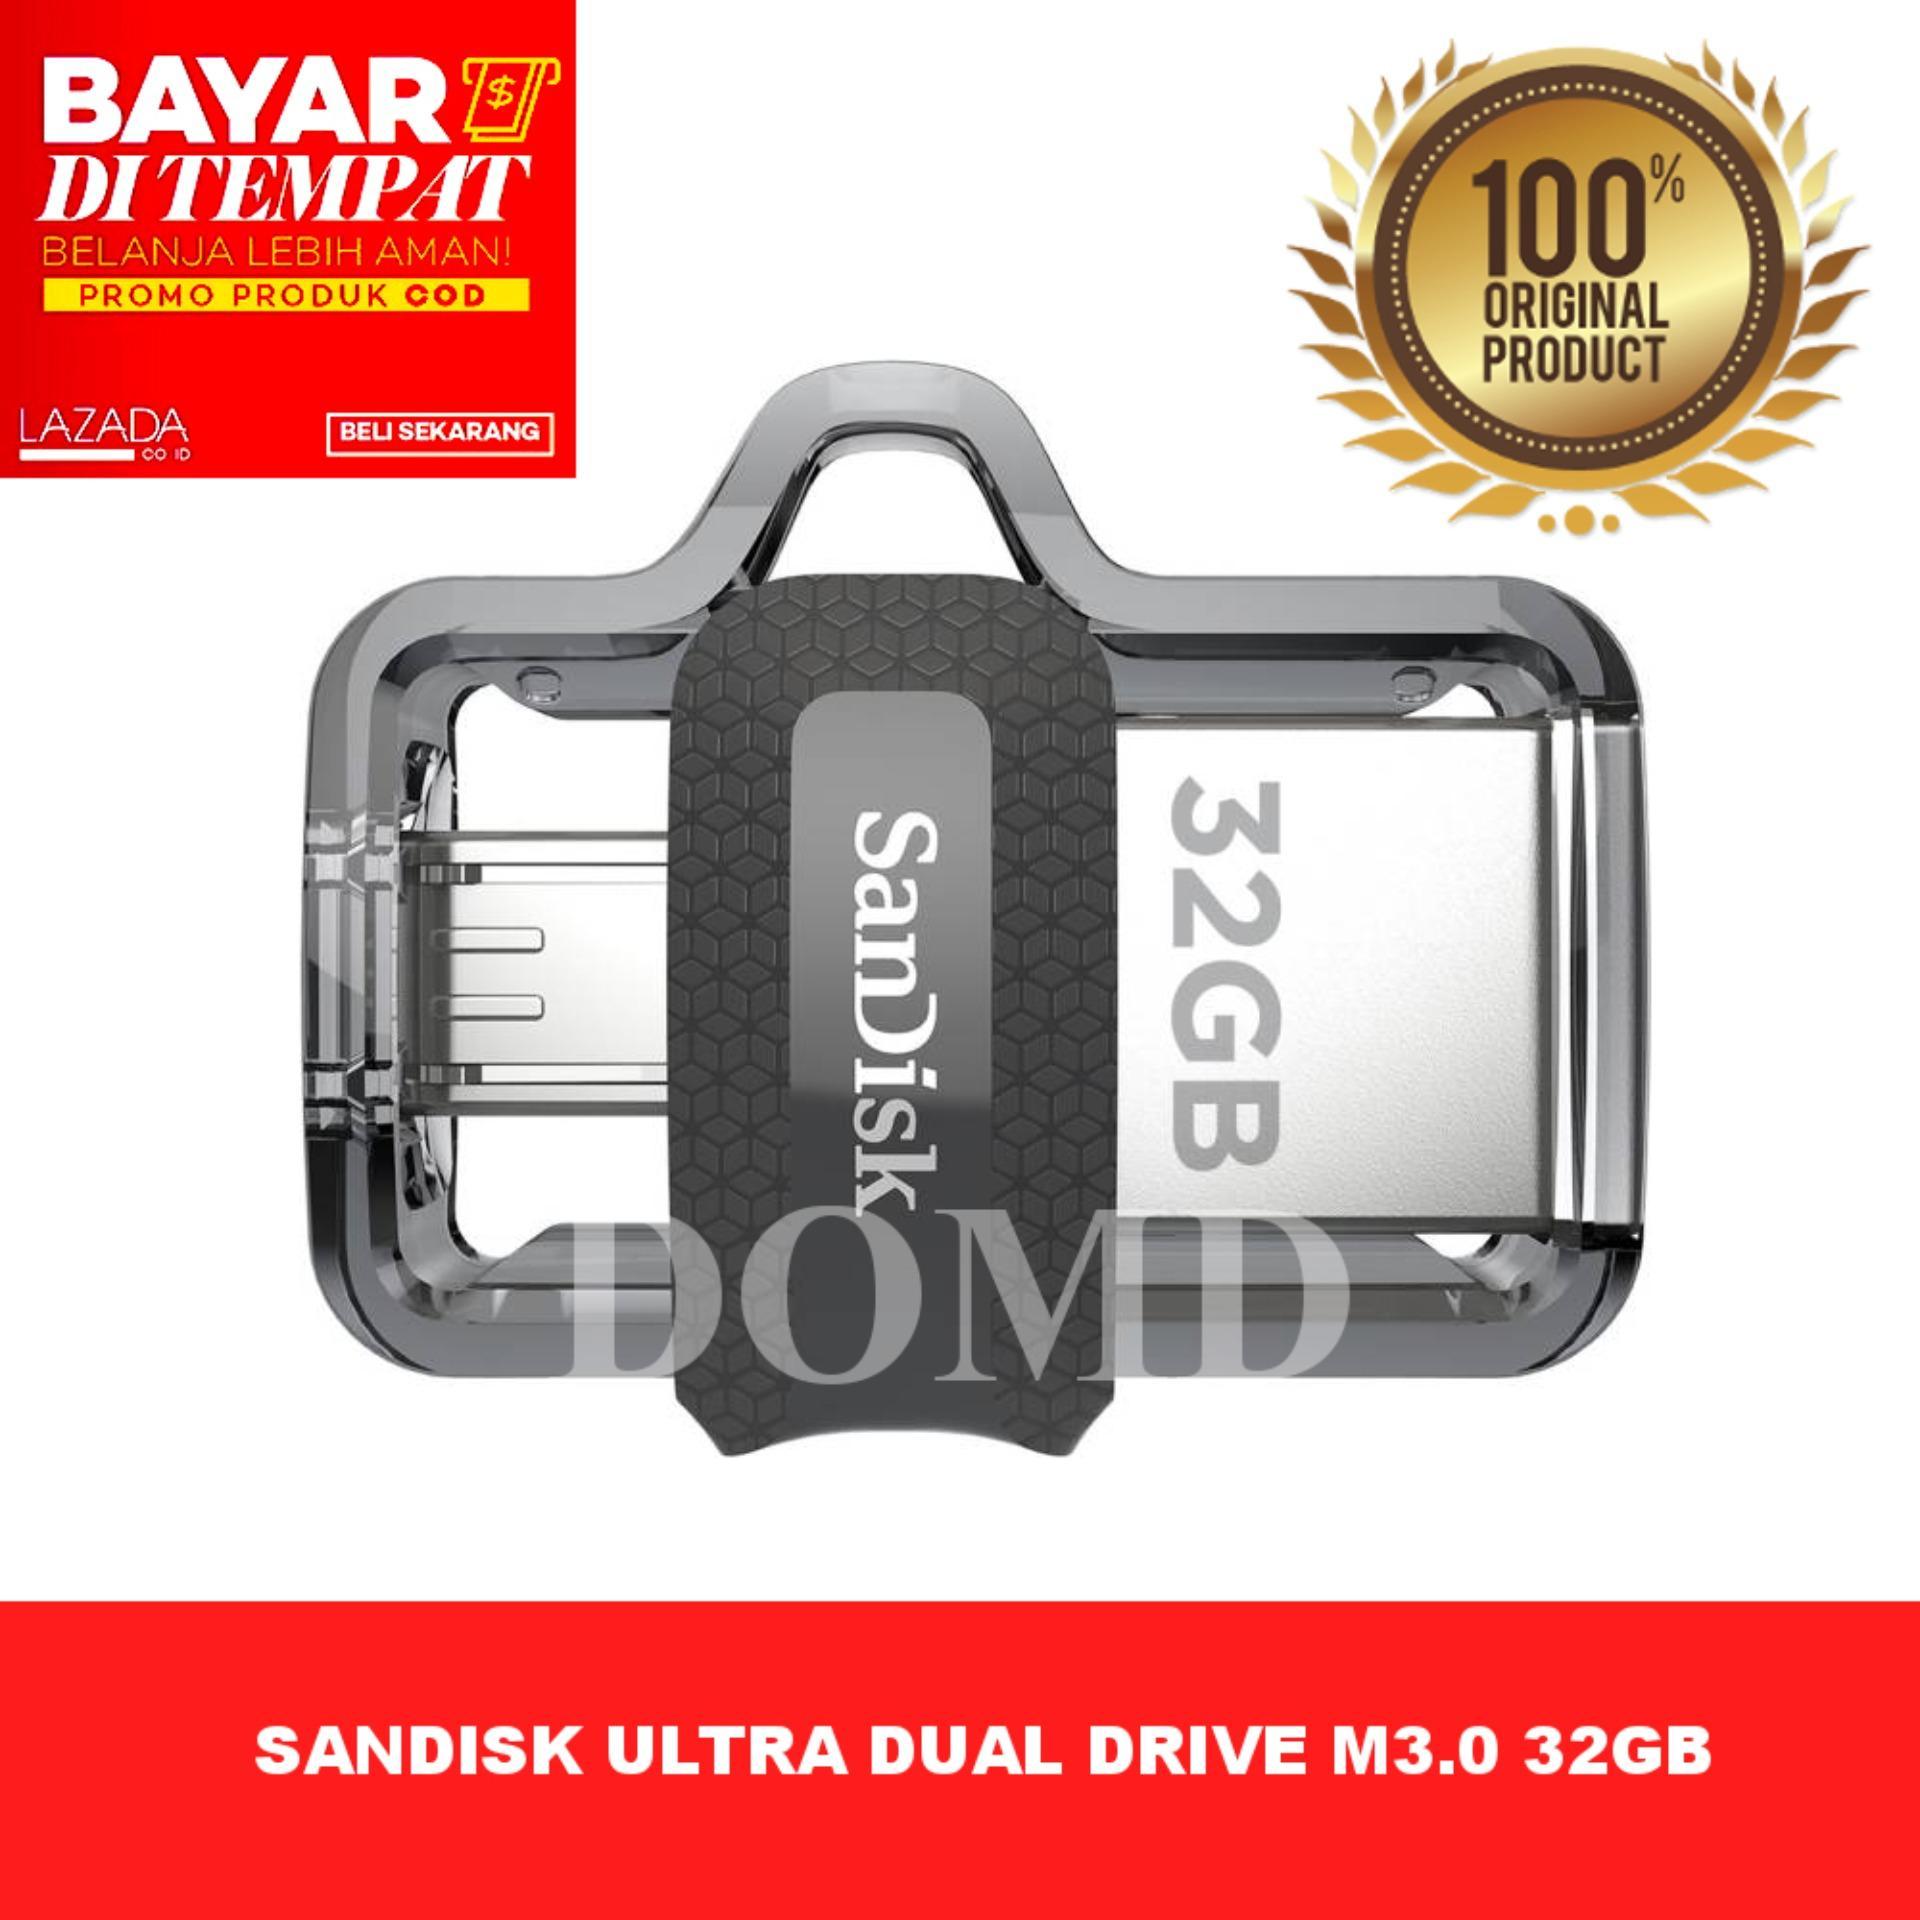 Sandisk Otg Ultra Dual Drive M3.0 32gb Usb 3.0 Flashdisk Otg Original Garansi Resmi Sandisk 5 Tahun By Domd.